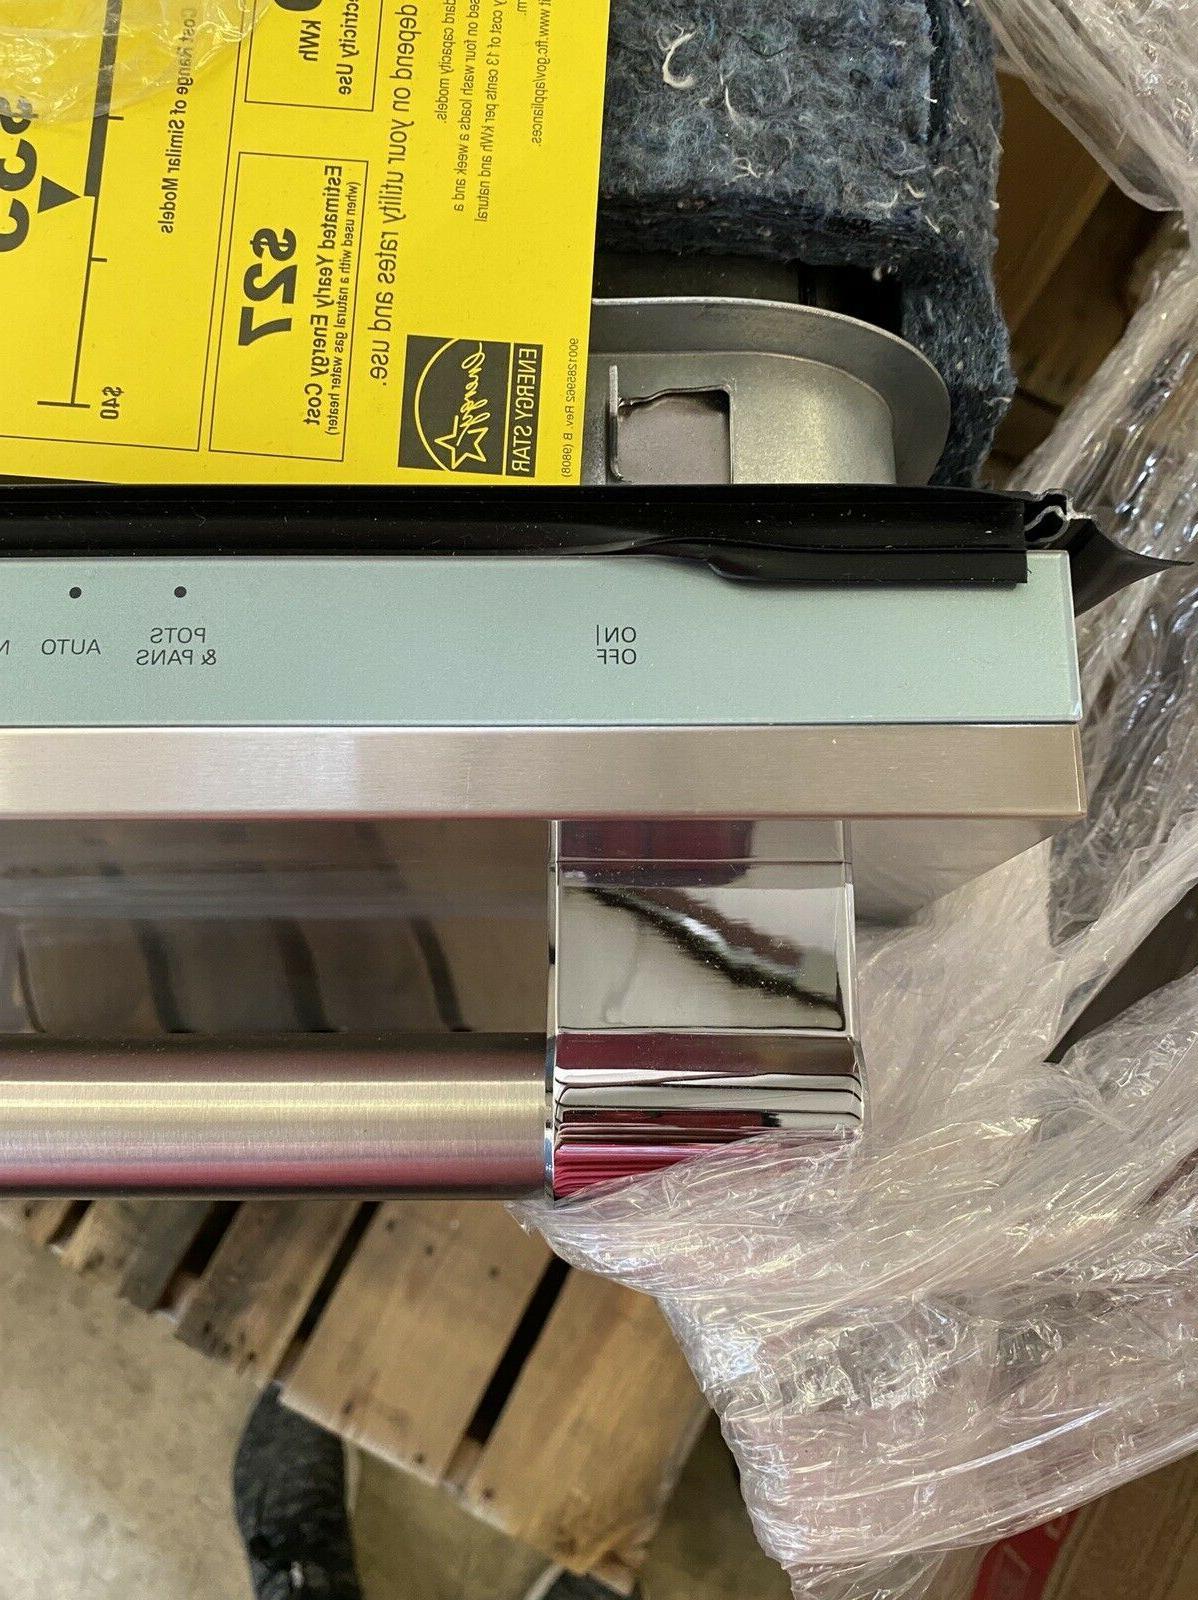 24 Inch Smart Built-In Dishwasher